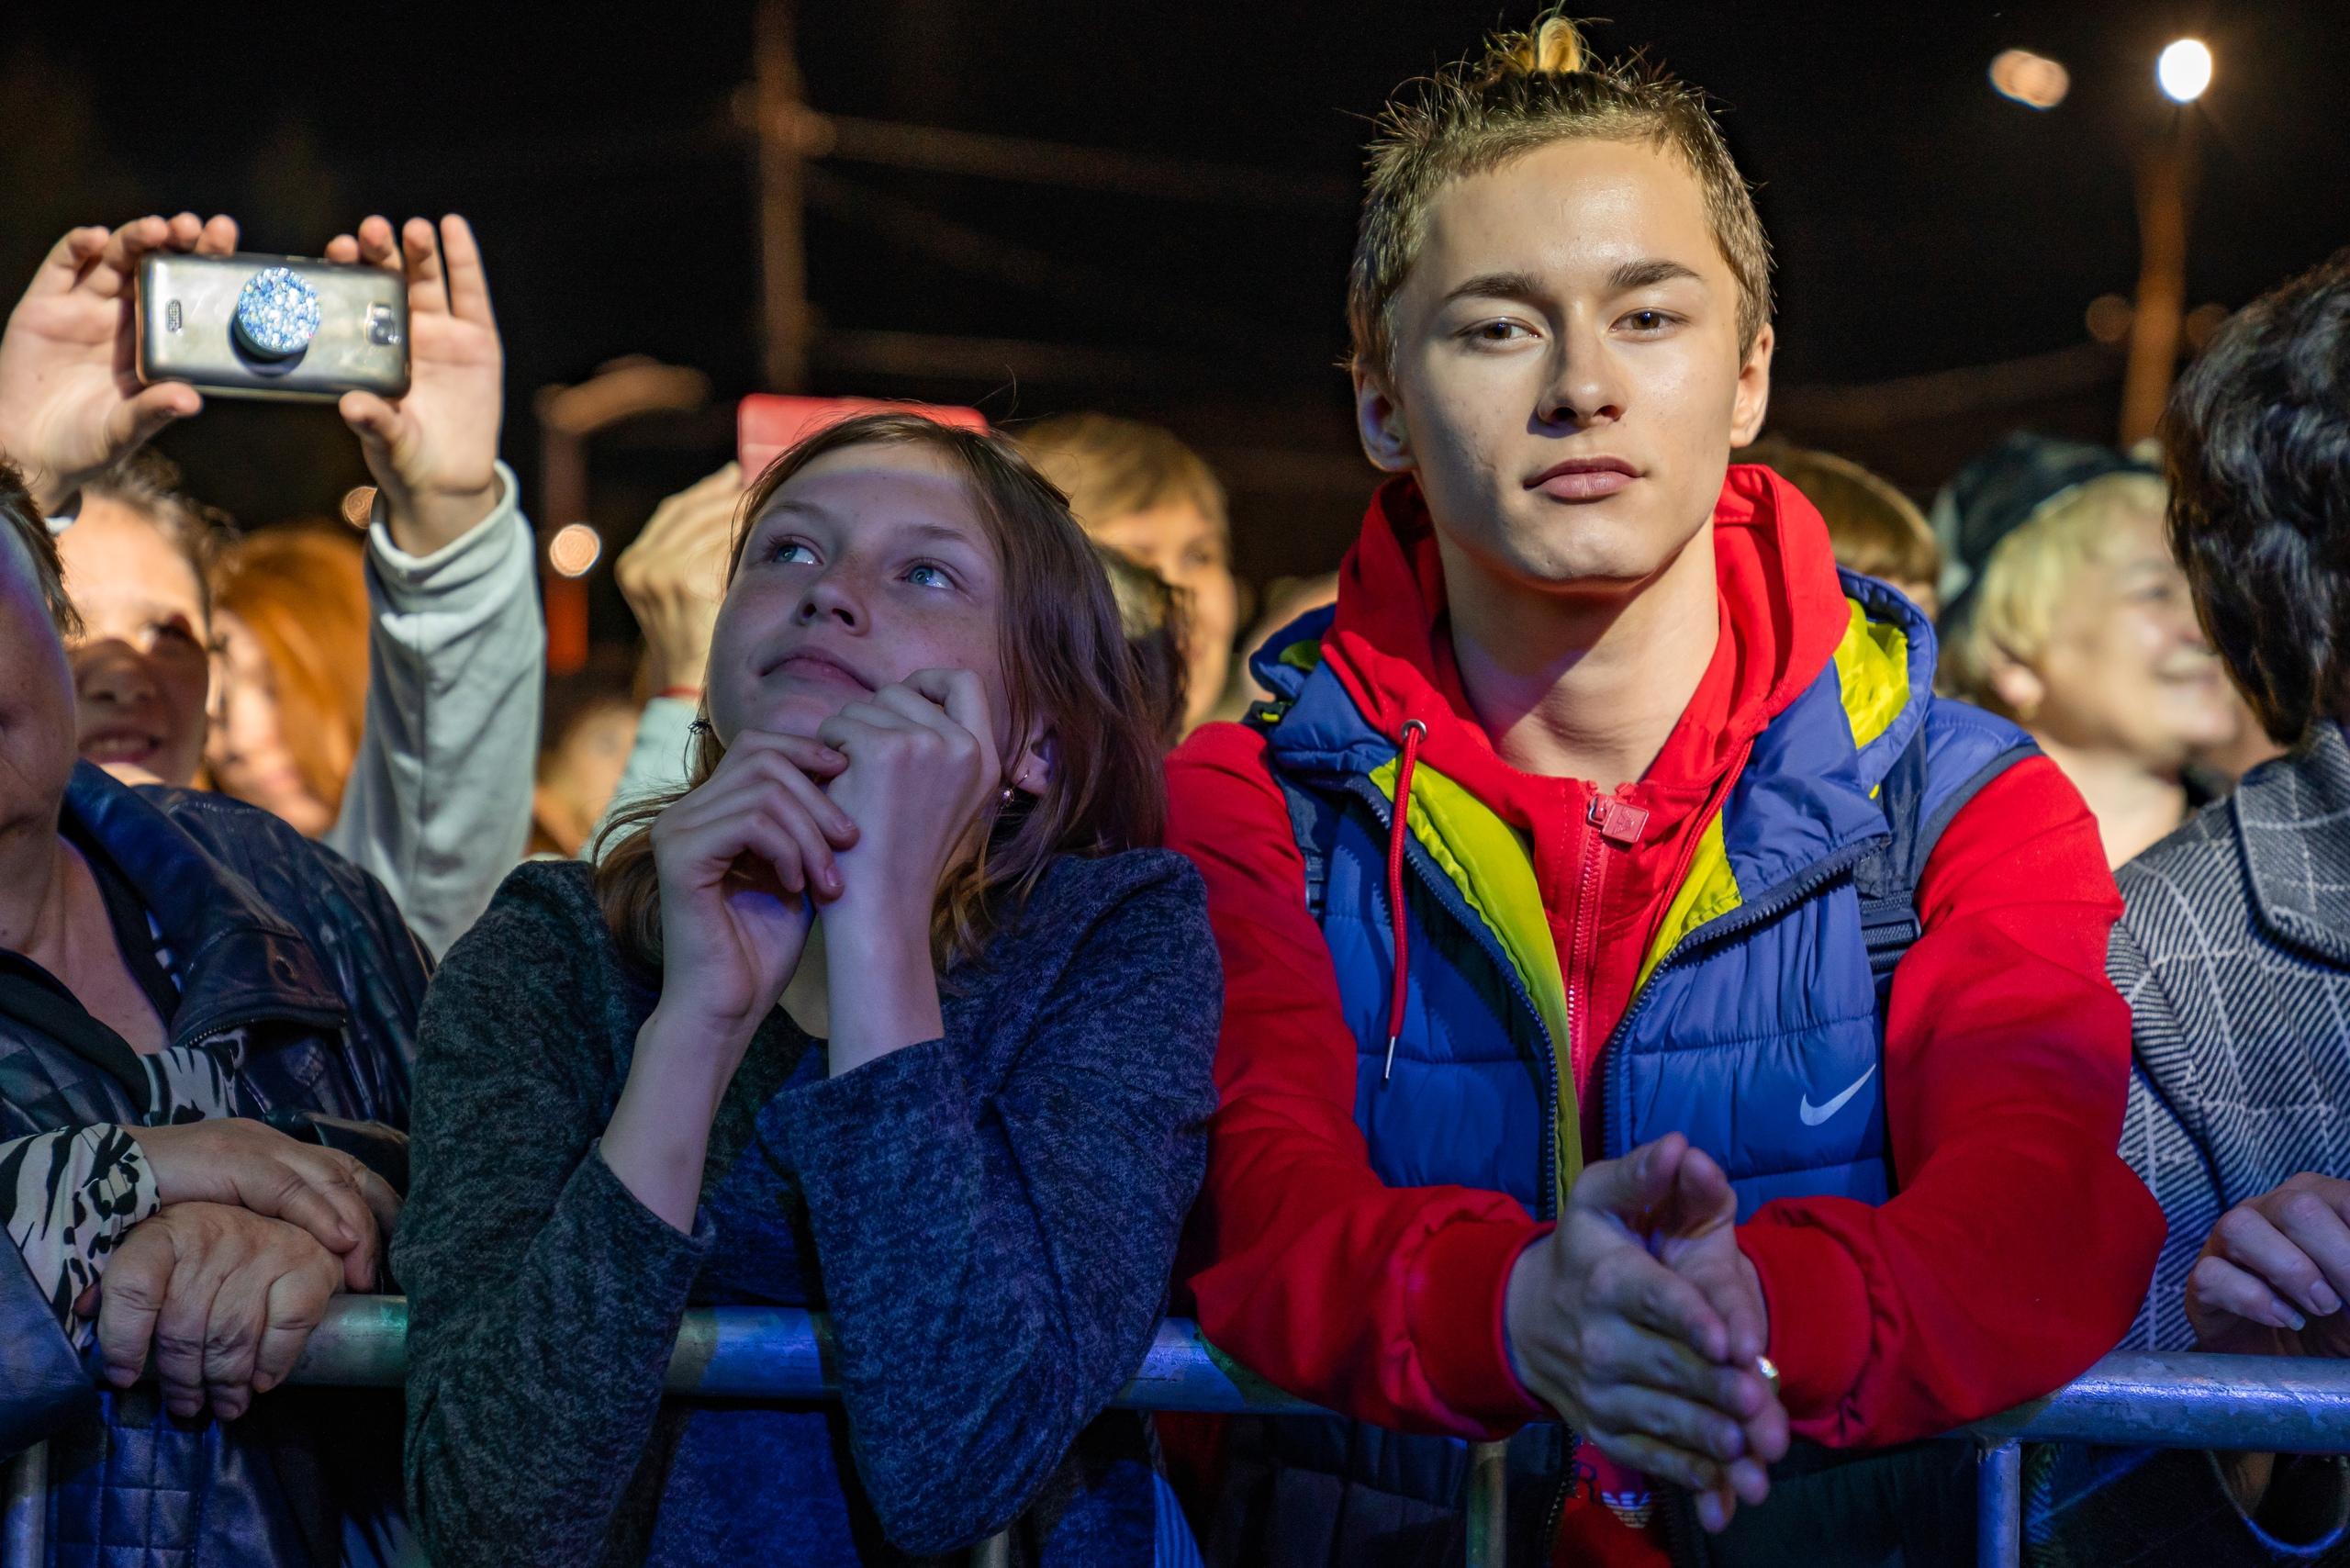 Кемеровчане споют внародном караоке вместе схором Турецкого